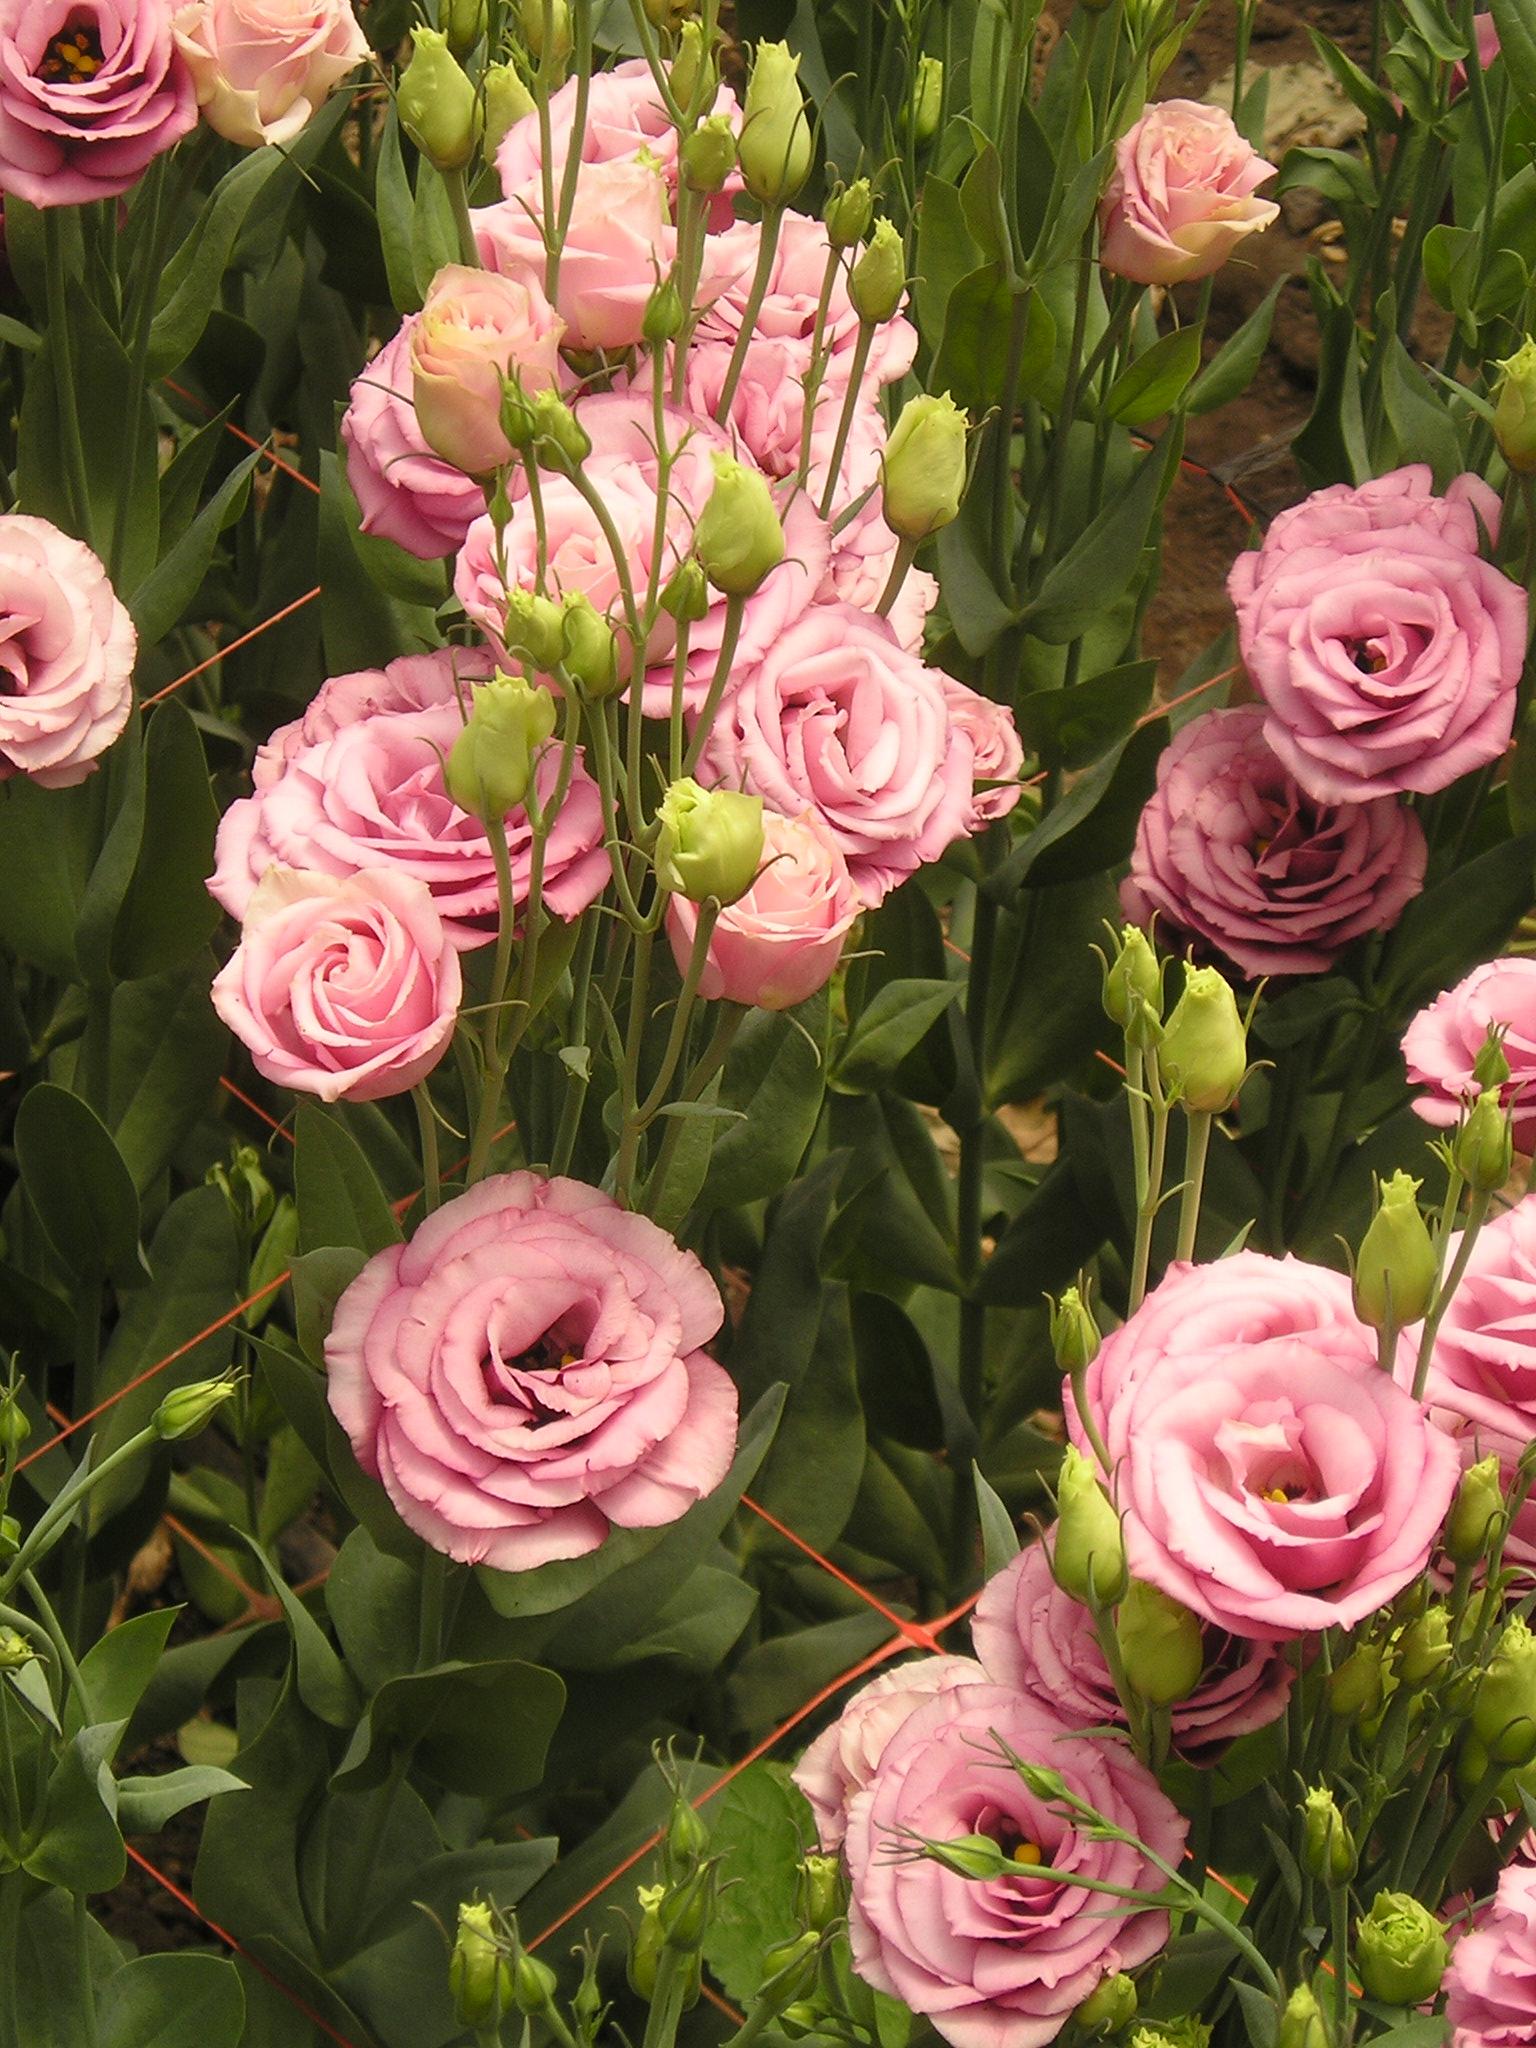 9 loai hoa dat nhat hanh tinh, co loai den vang 9999 cung khong la gi hinh anh 19